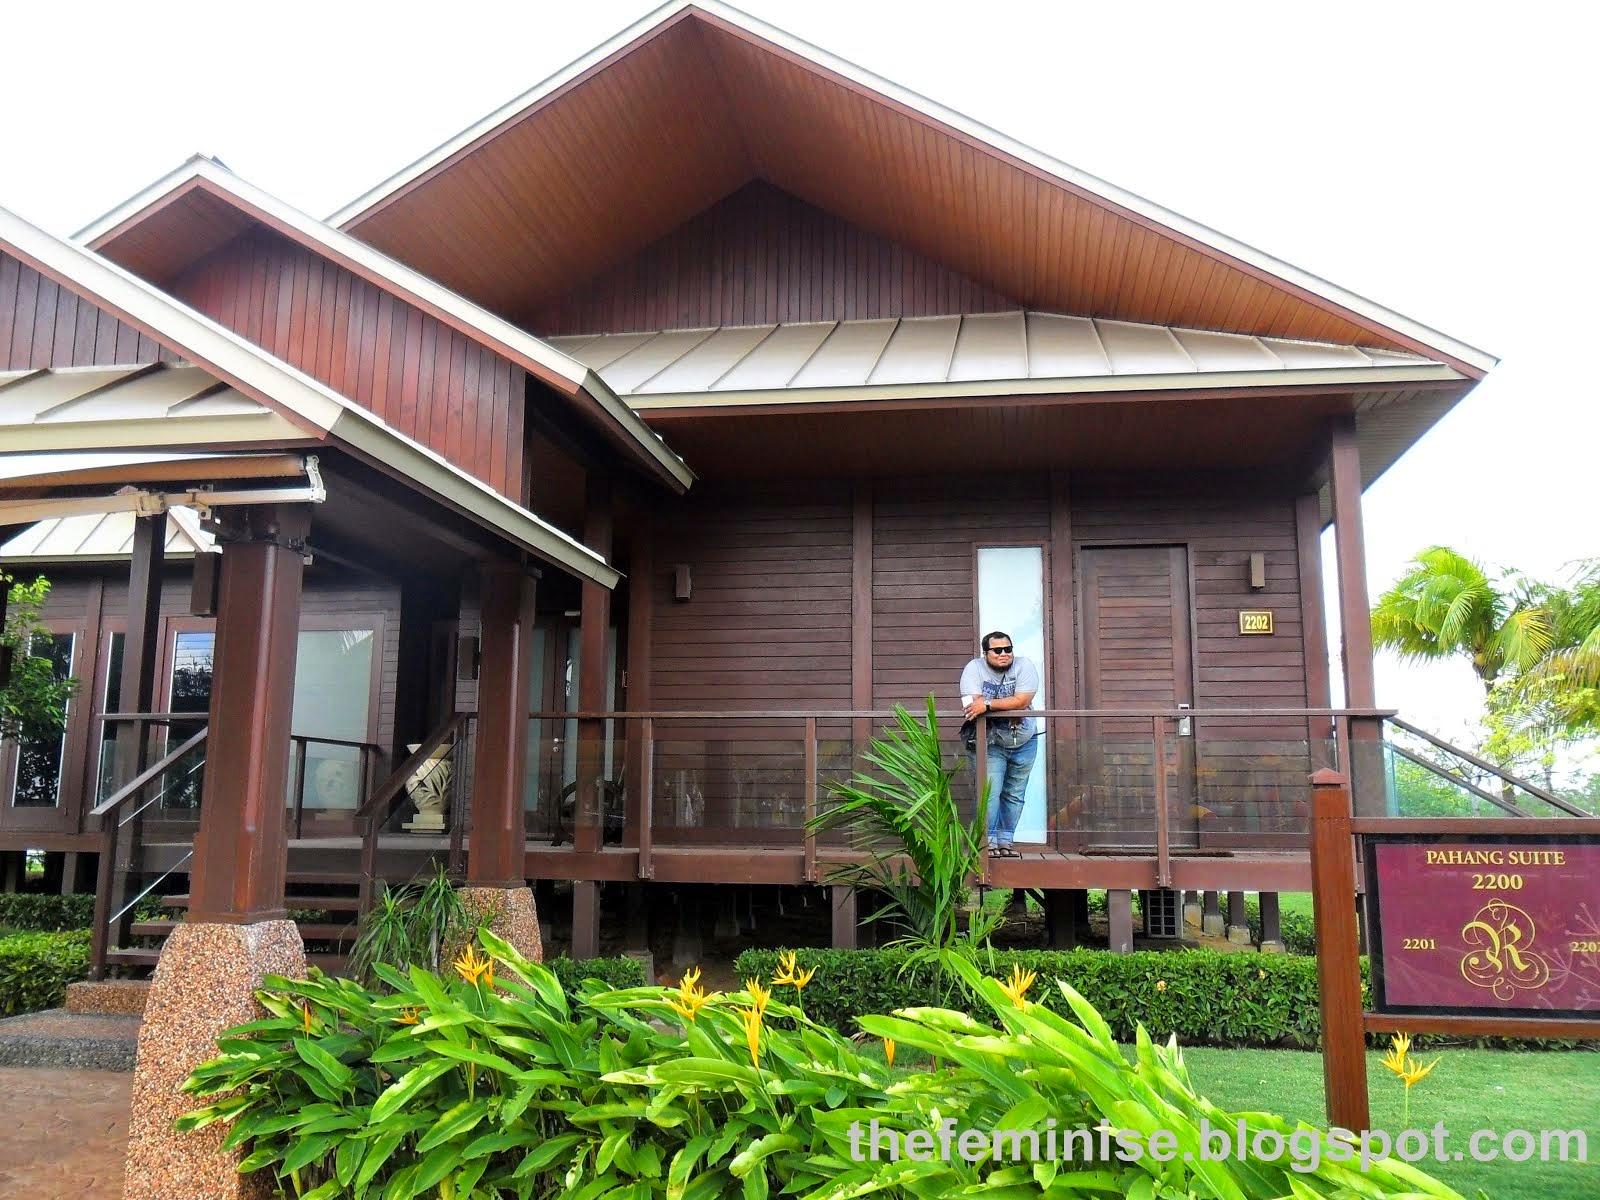 Ri-Yaz Heritage Marina Resort & Spa, Pulau Duyong, Kuala Terengganu